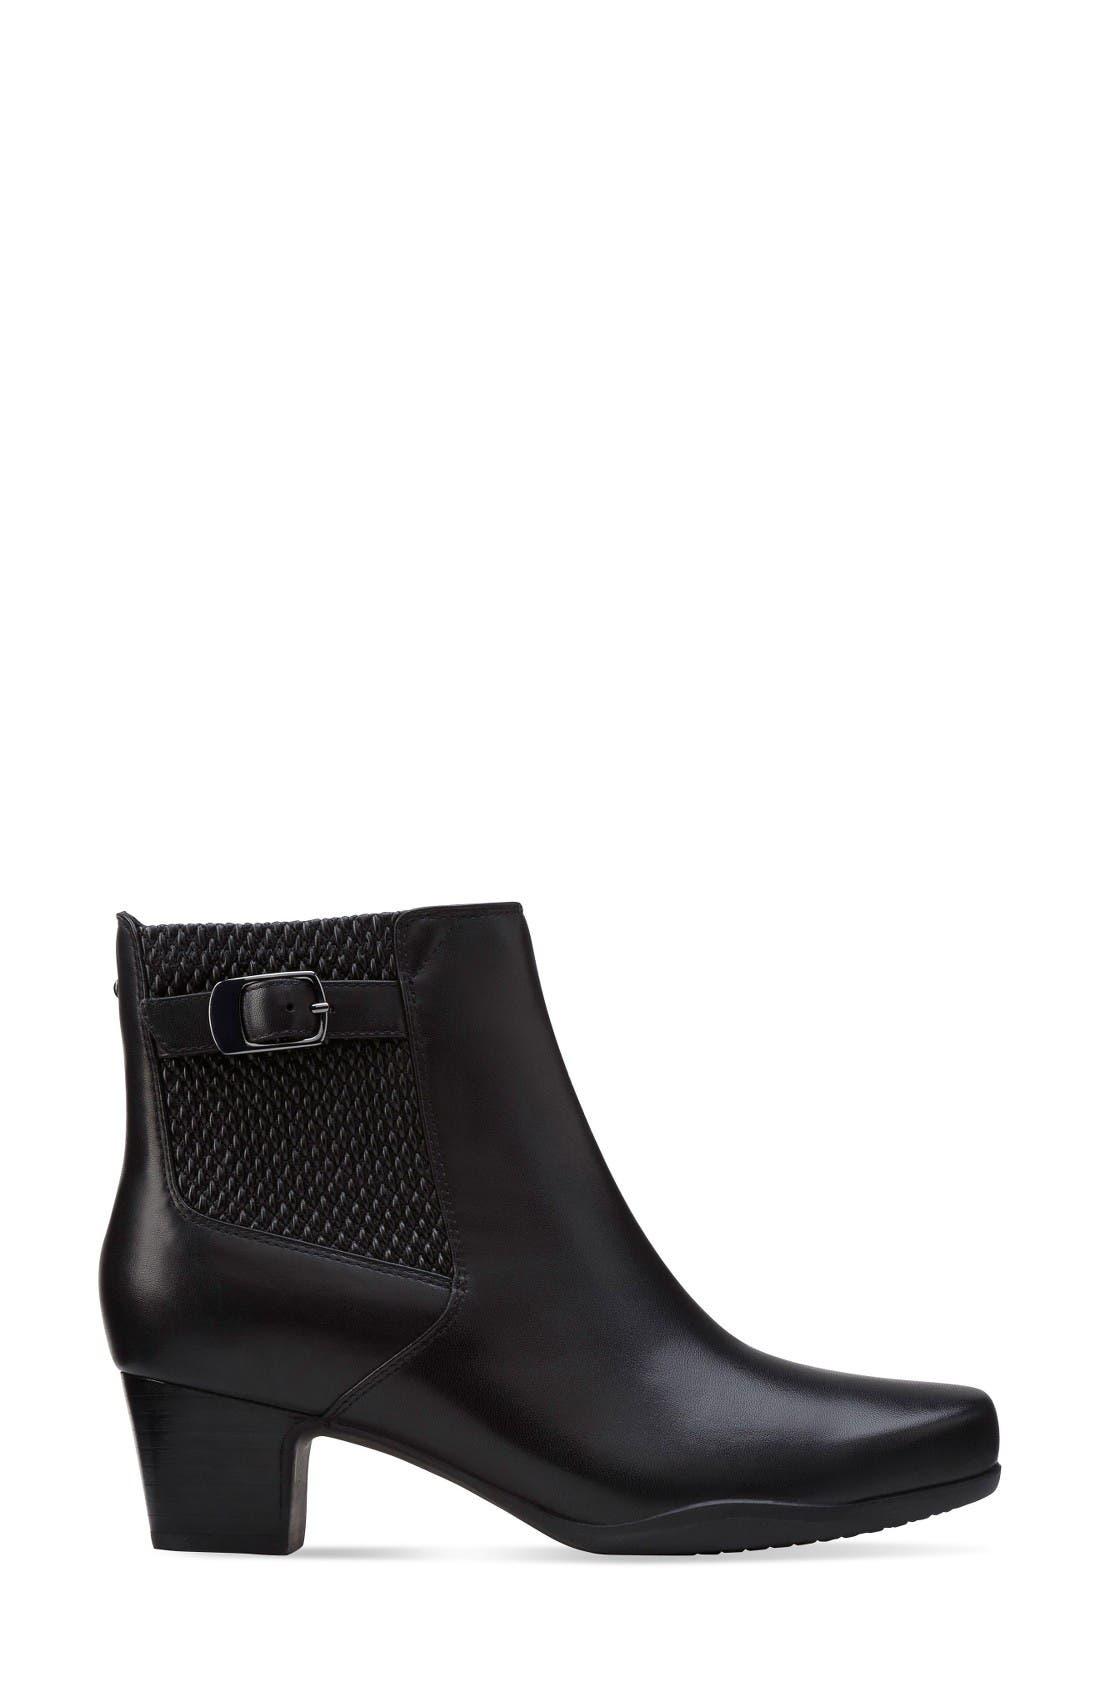 Rosalyn Lara Waterproof Boot,                             Alternate thumbnail 3, color,                             Black Leather